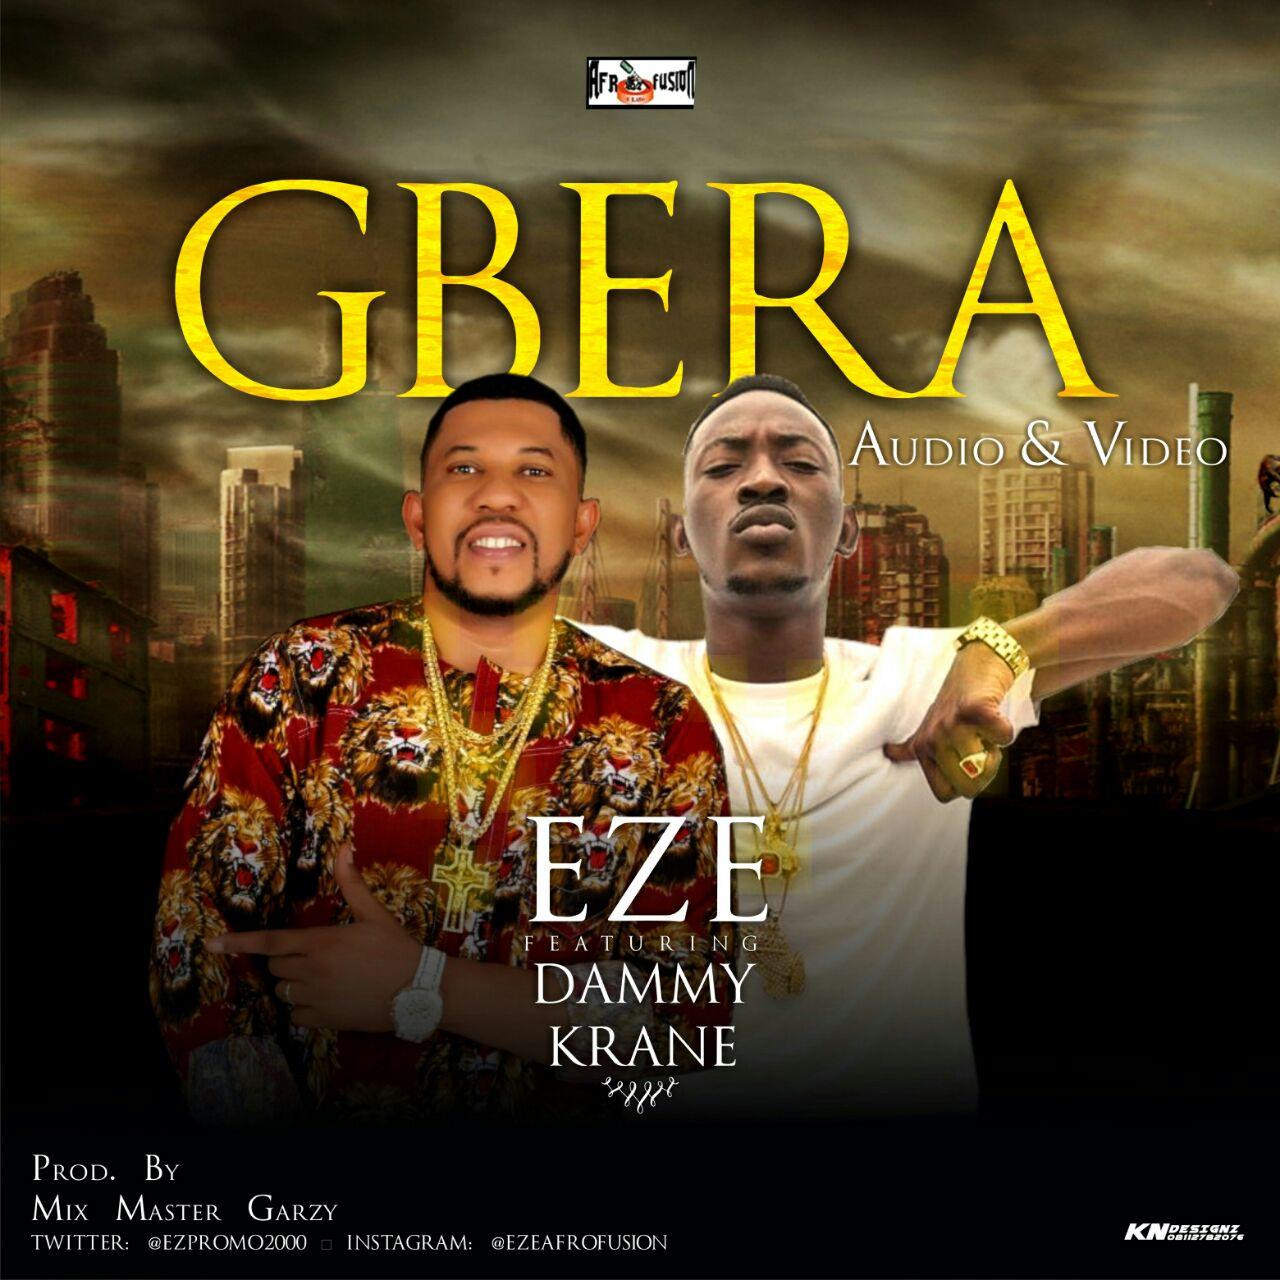 VIDEO: Eze ft. Dammy Krane - Gbera